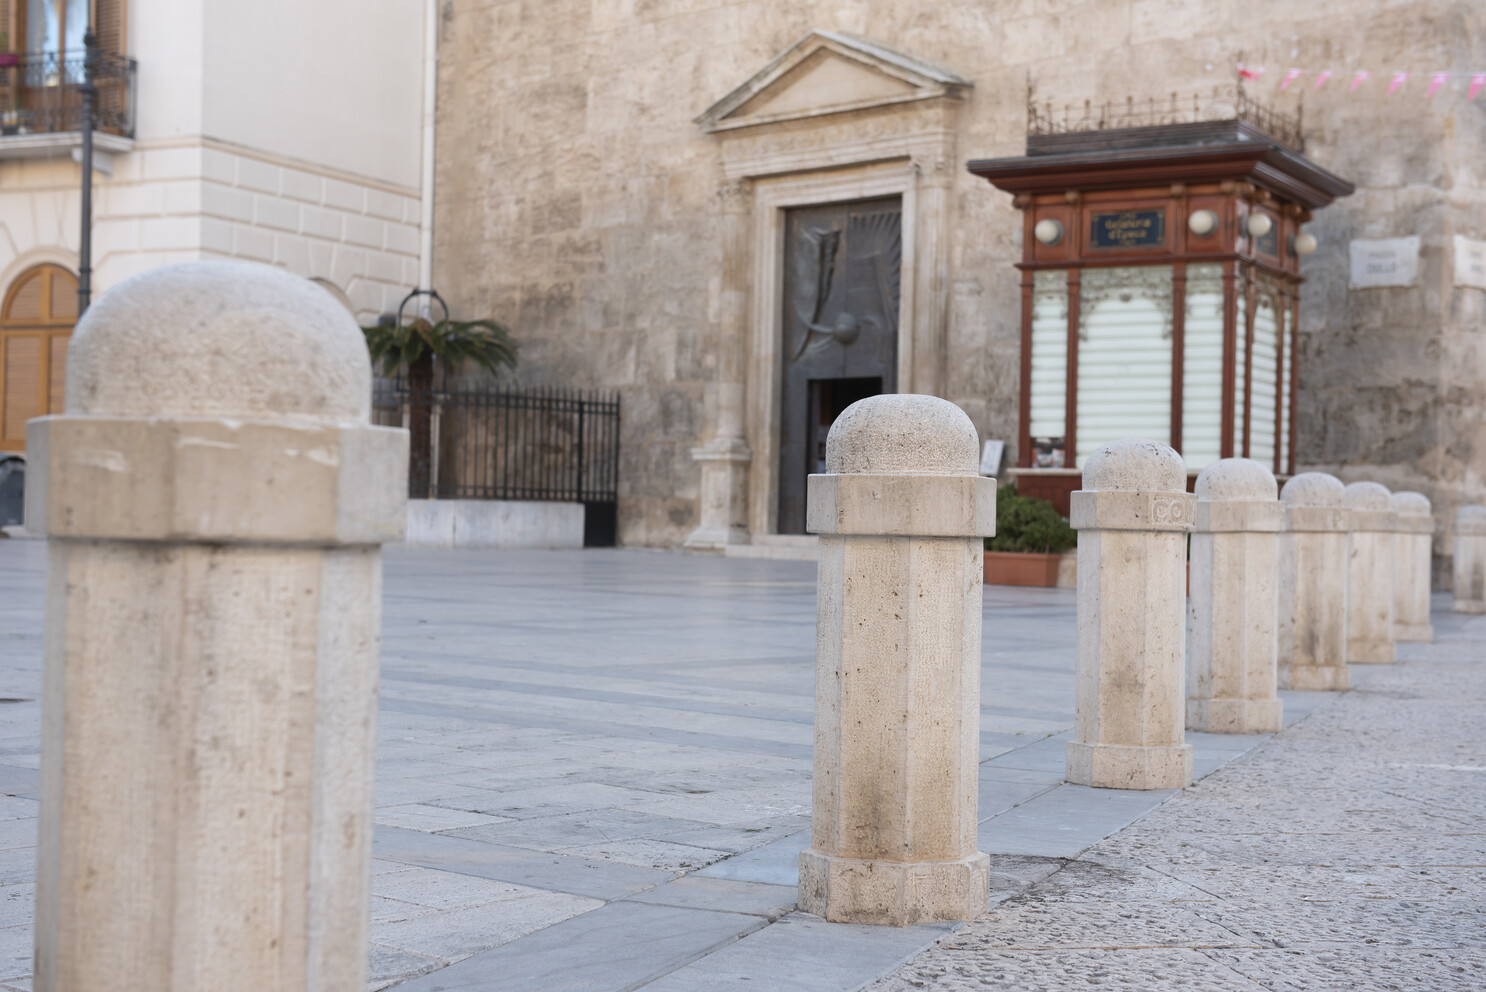 Disuasiori Piazza Ciullo 3